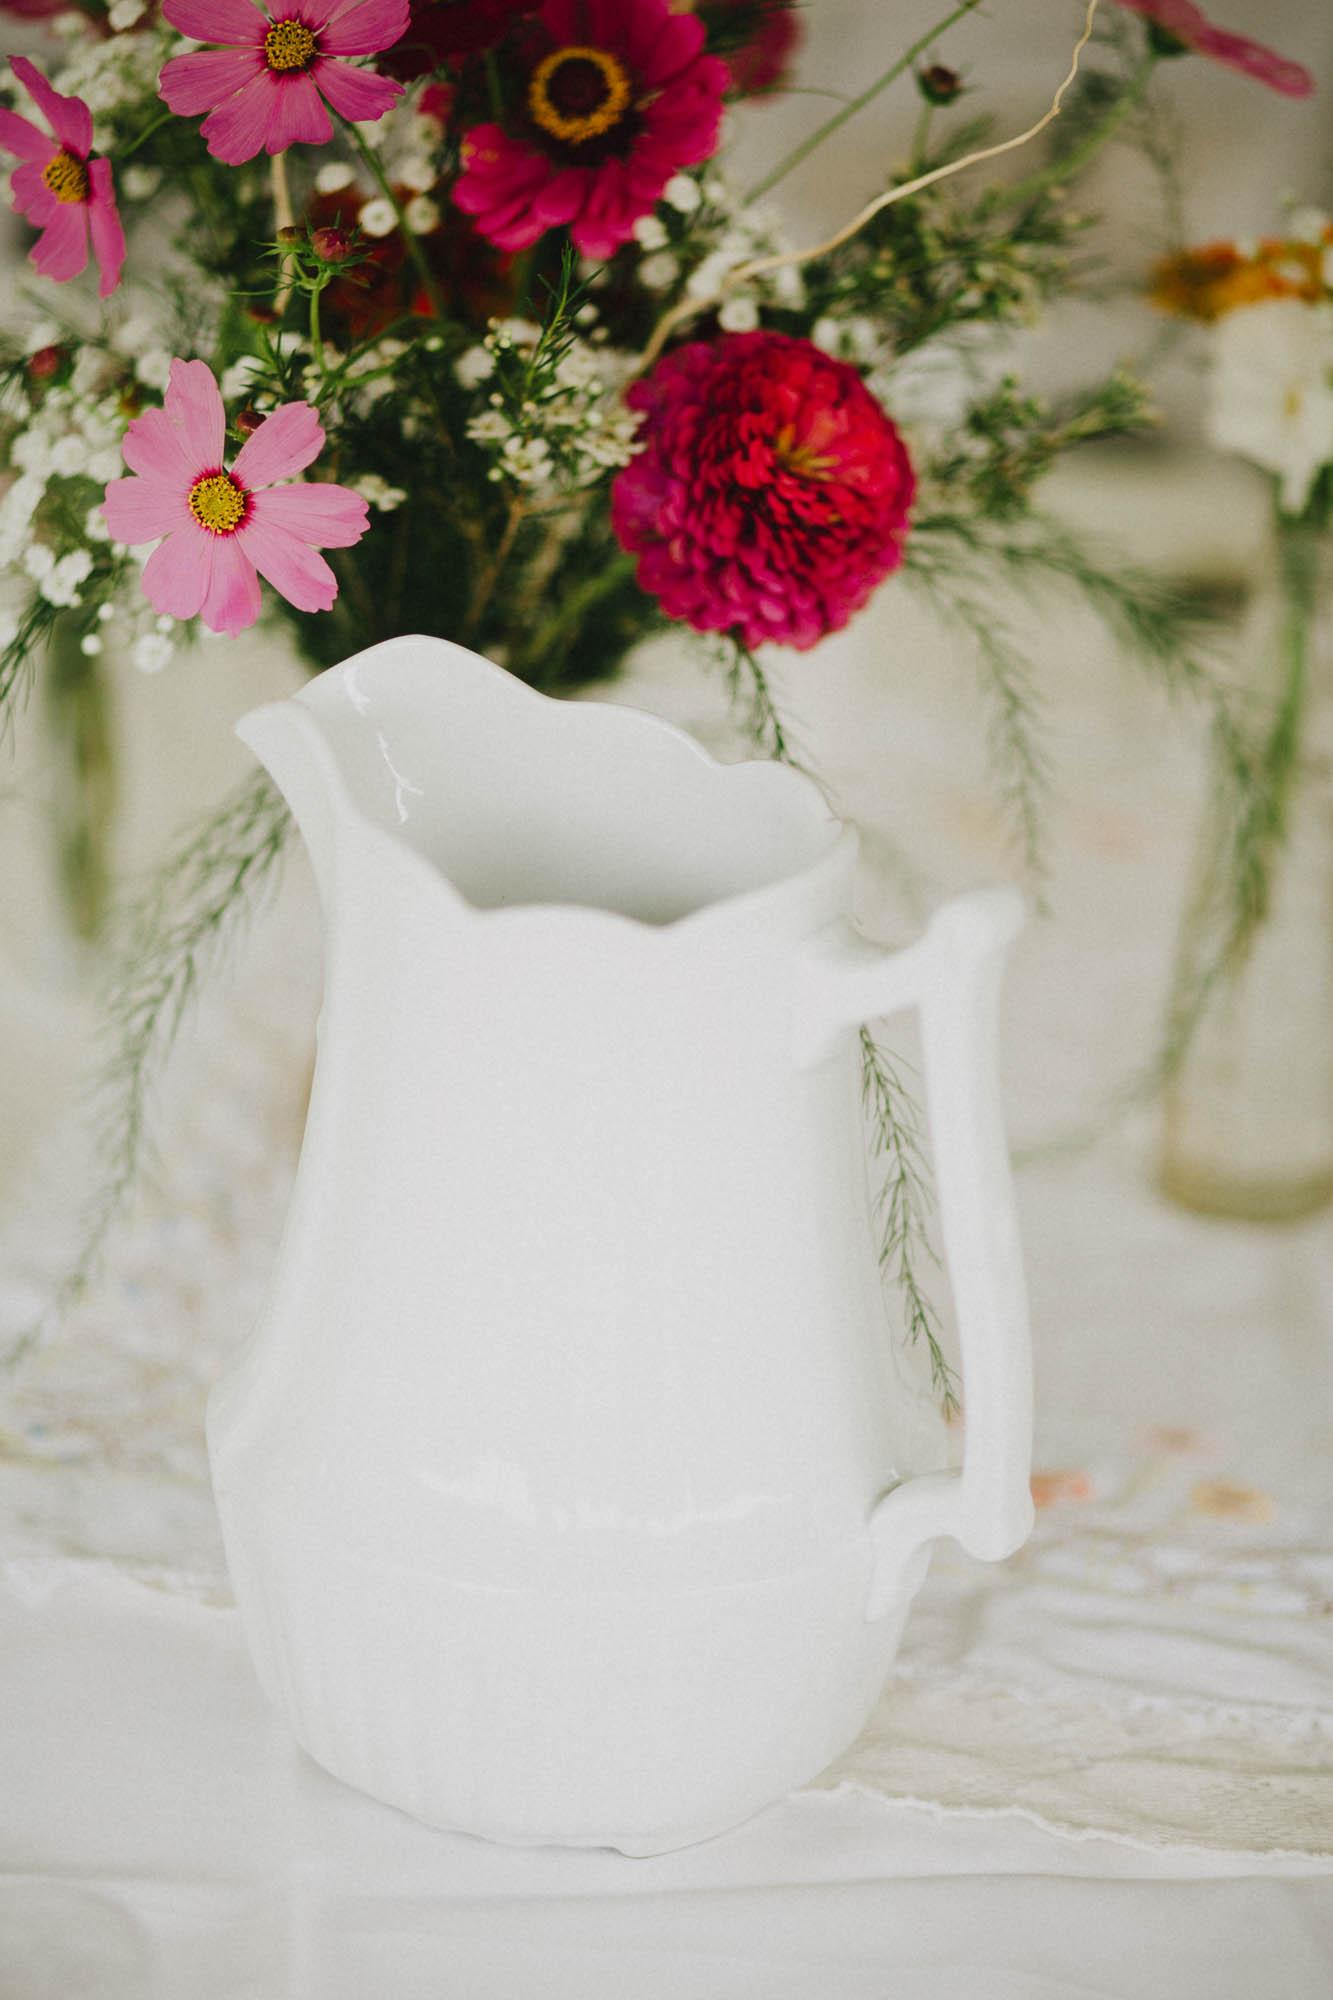 Leah-Graham-Outdoor-DIY-Michigan-Wedding-Details-011@2x.jpg